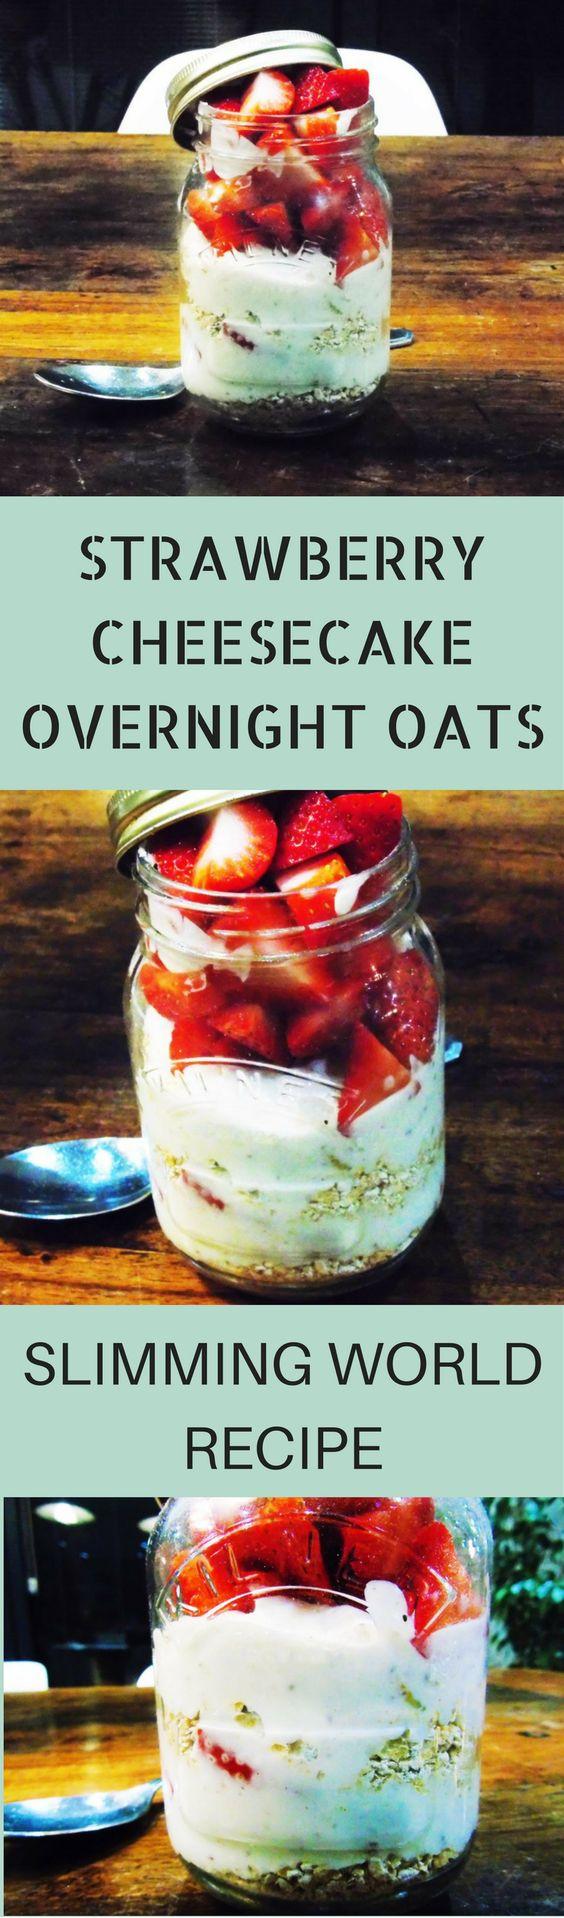 Strawberry Cheesecake Overnight Oats Recipe